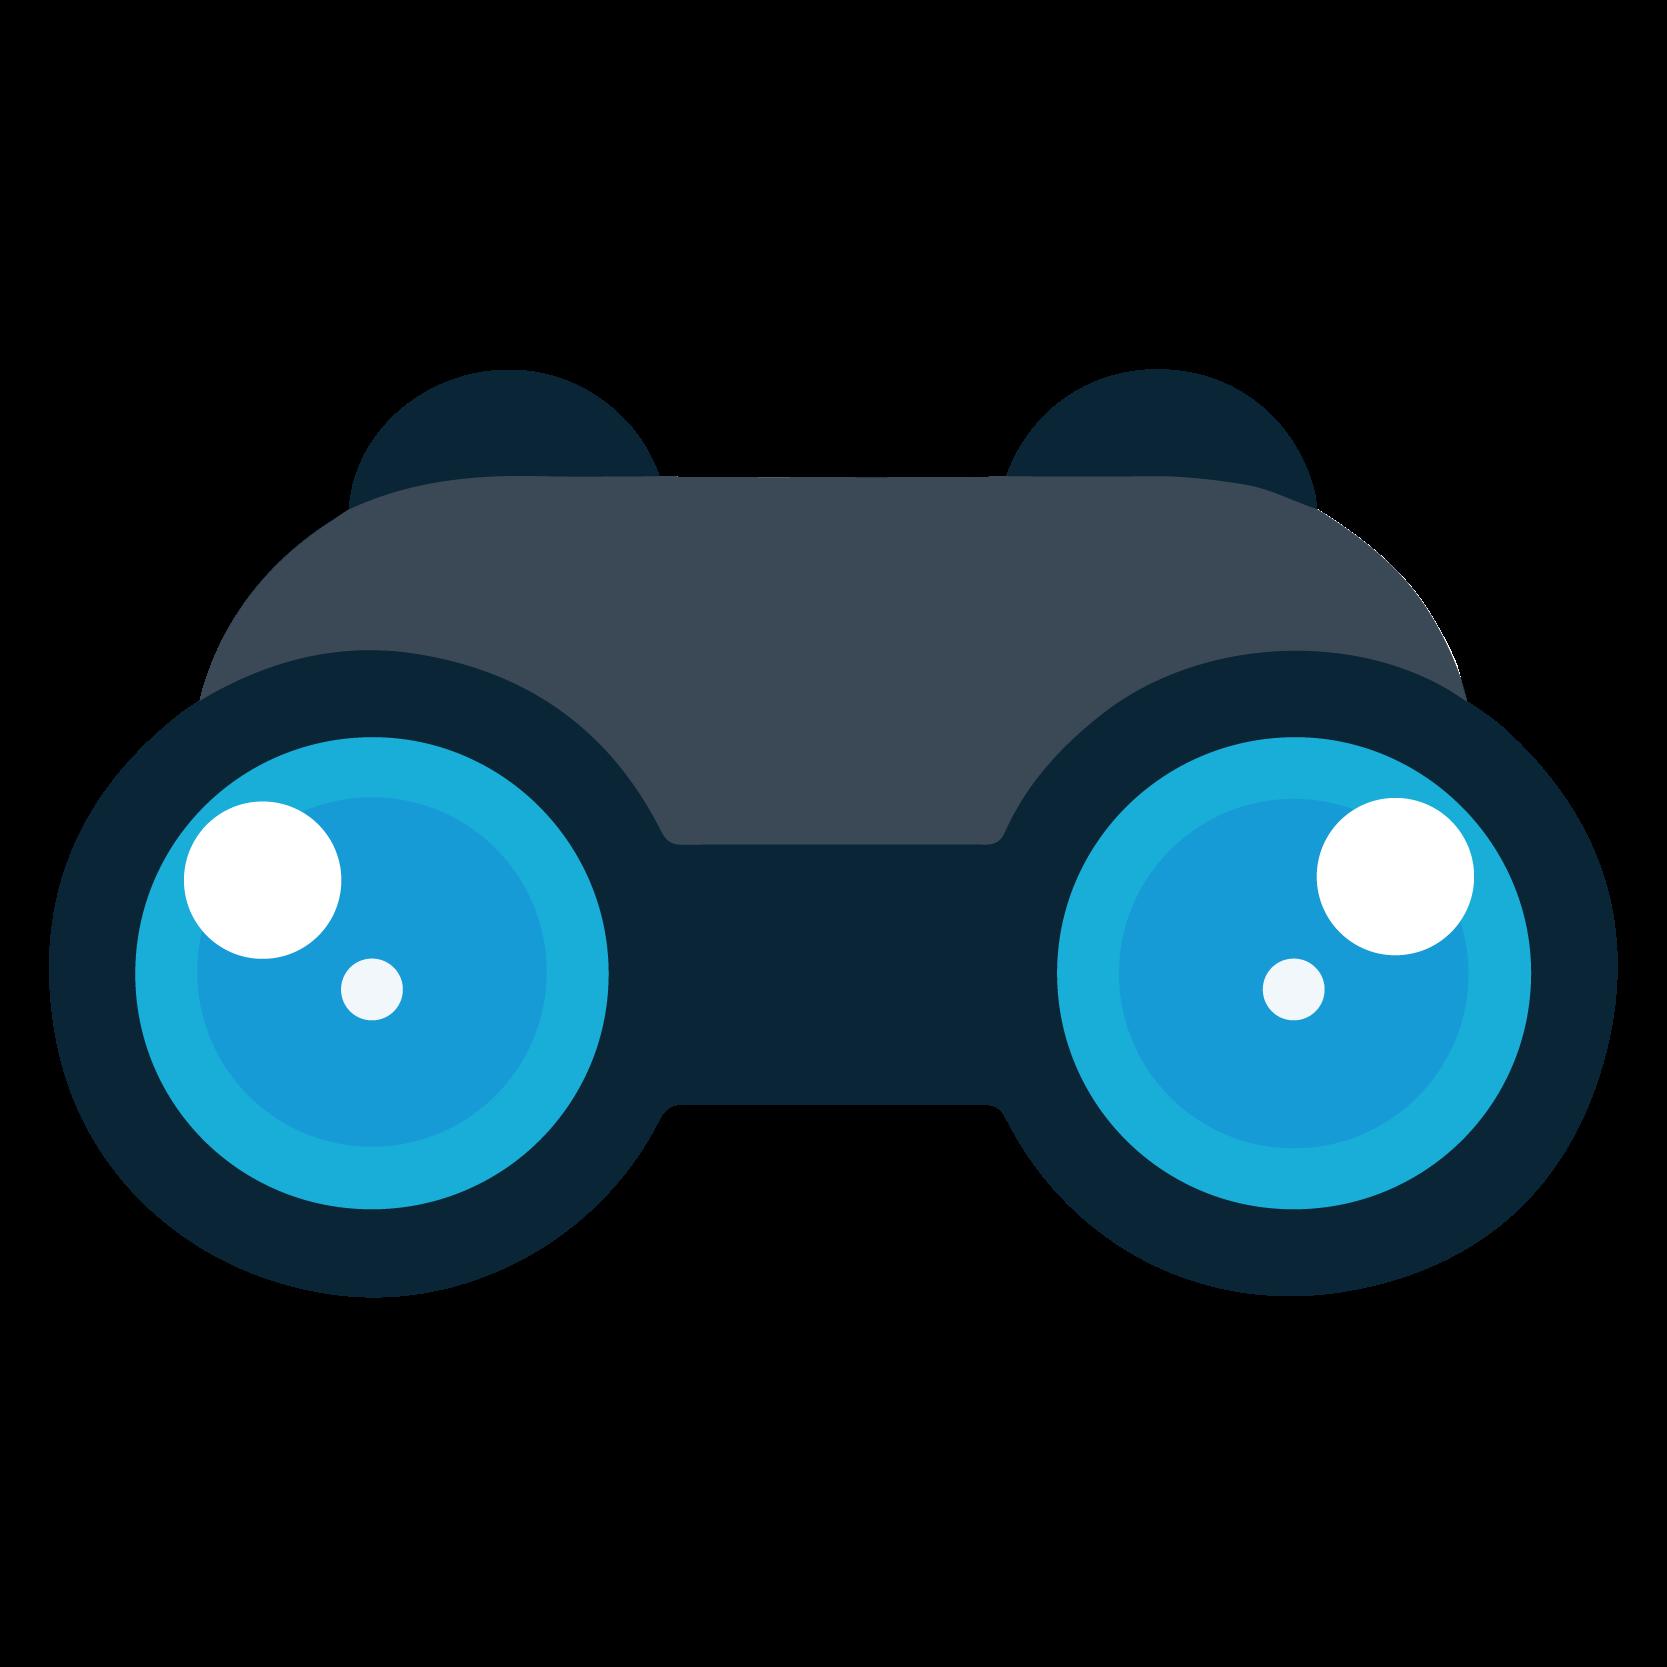 clip transparent download Binocular clipart ambiguity. Binoculars visibility frames illustrations.